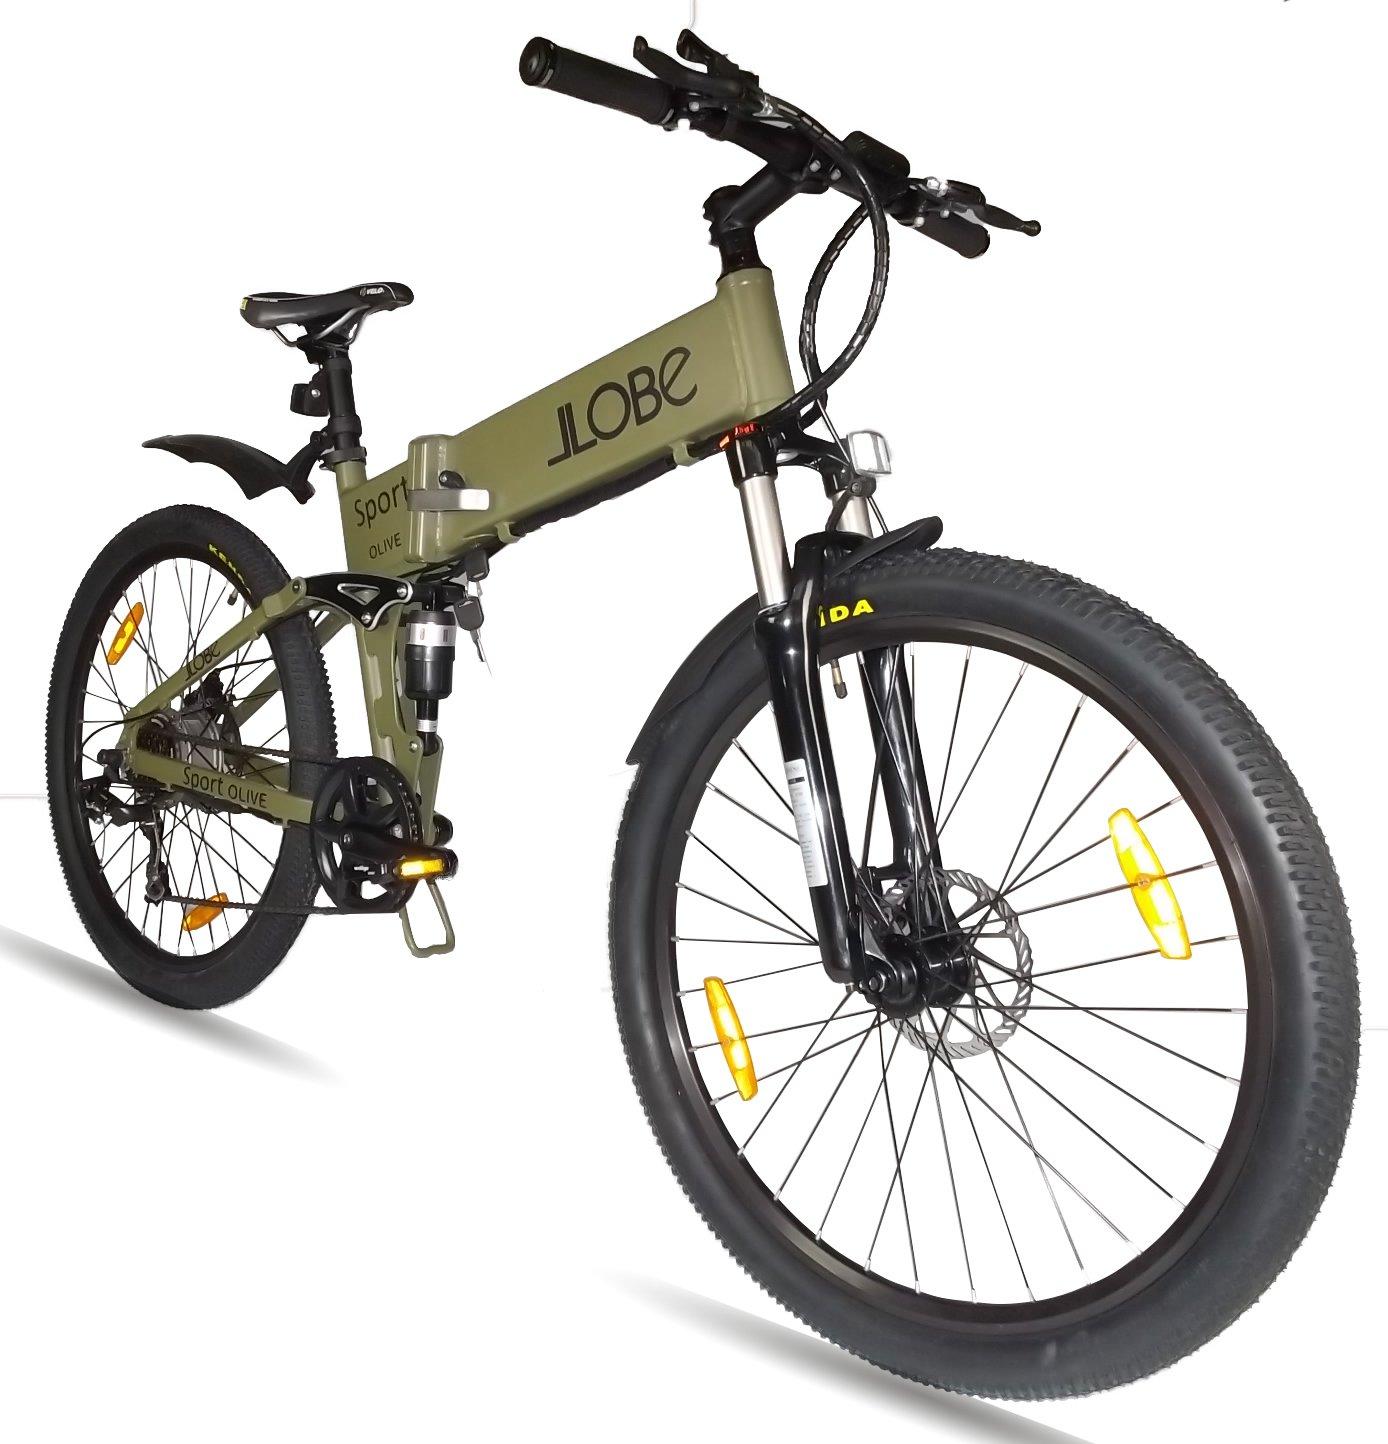 LLobe Erwachsene 26 Zoll Alu Falt Mountain E-bike Sport, Olivegrün ...